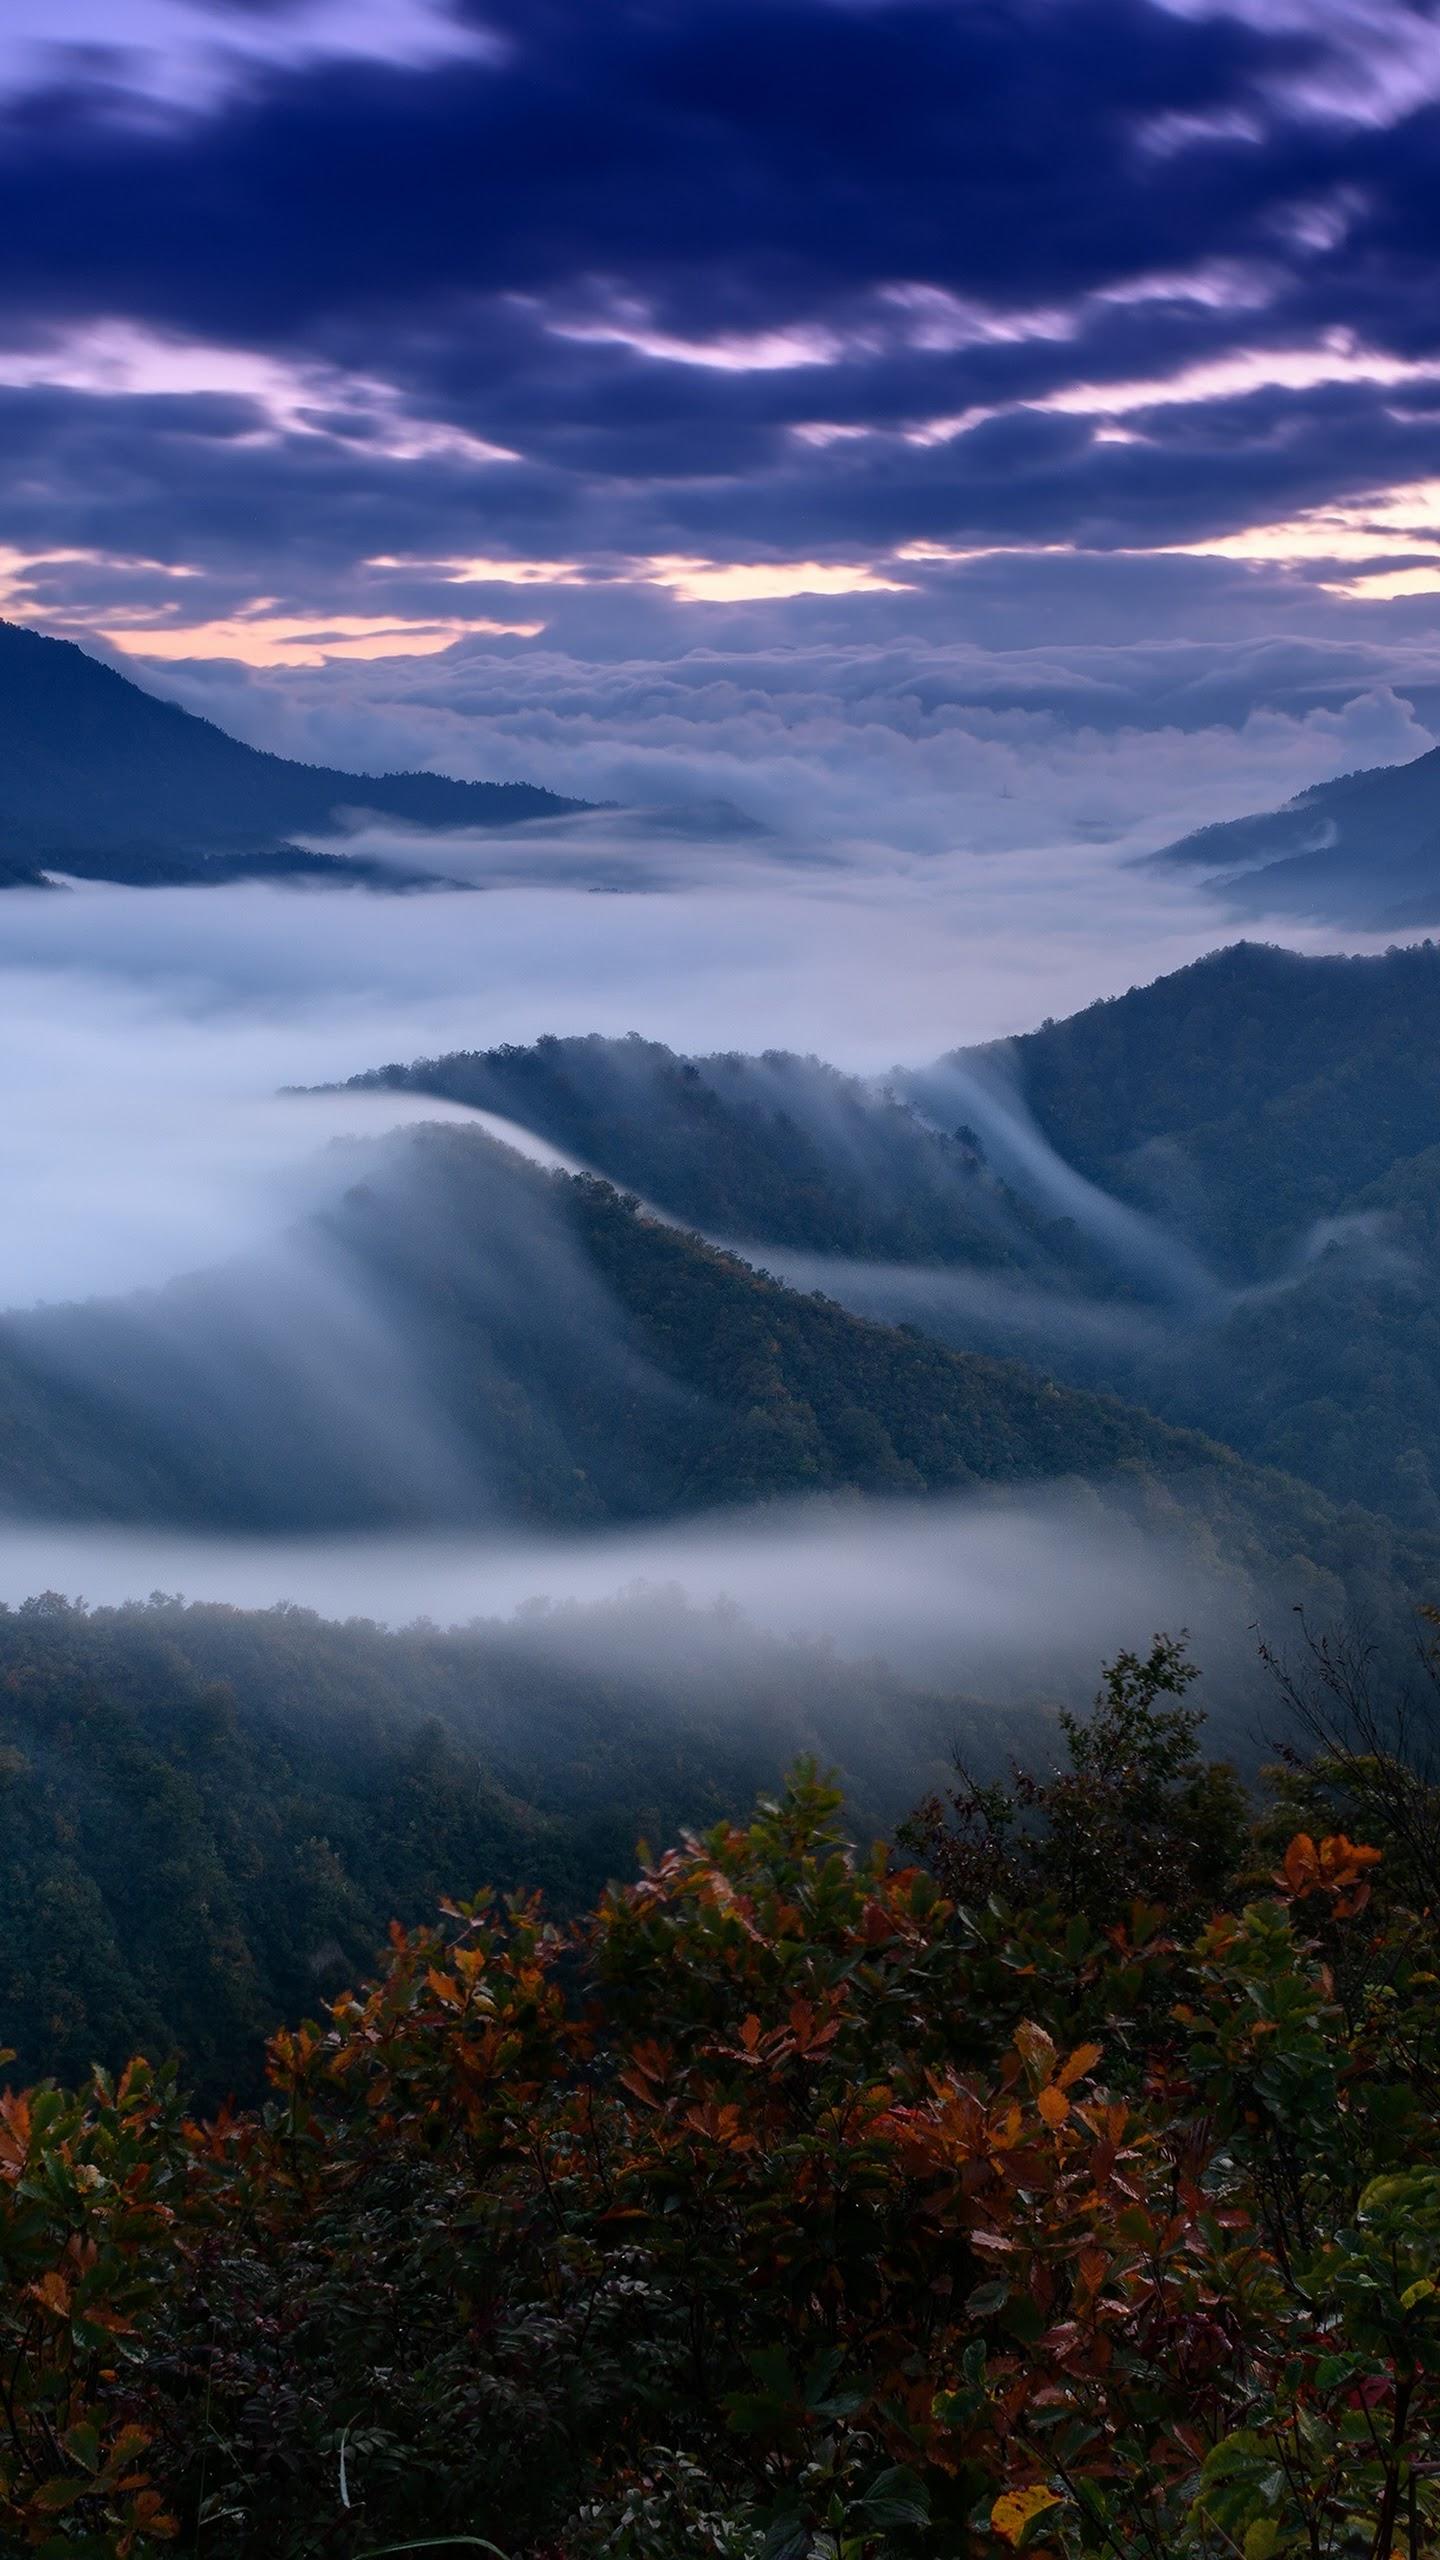 Mountain Fog Scenery Landscape Nature 4k Wallpaper 180